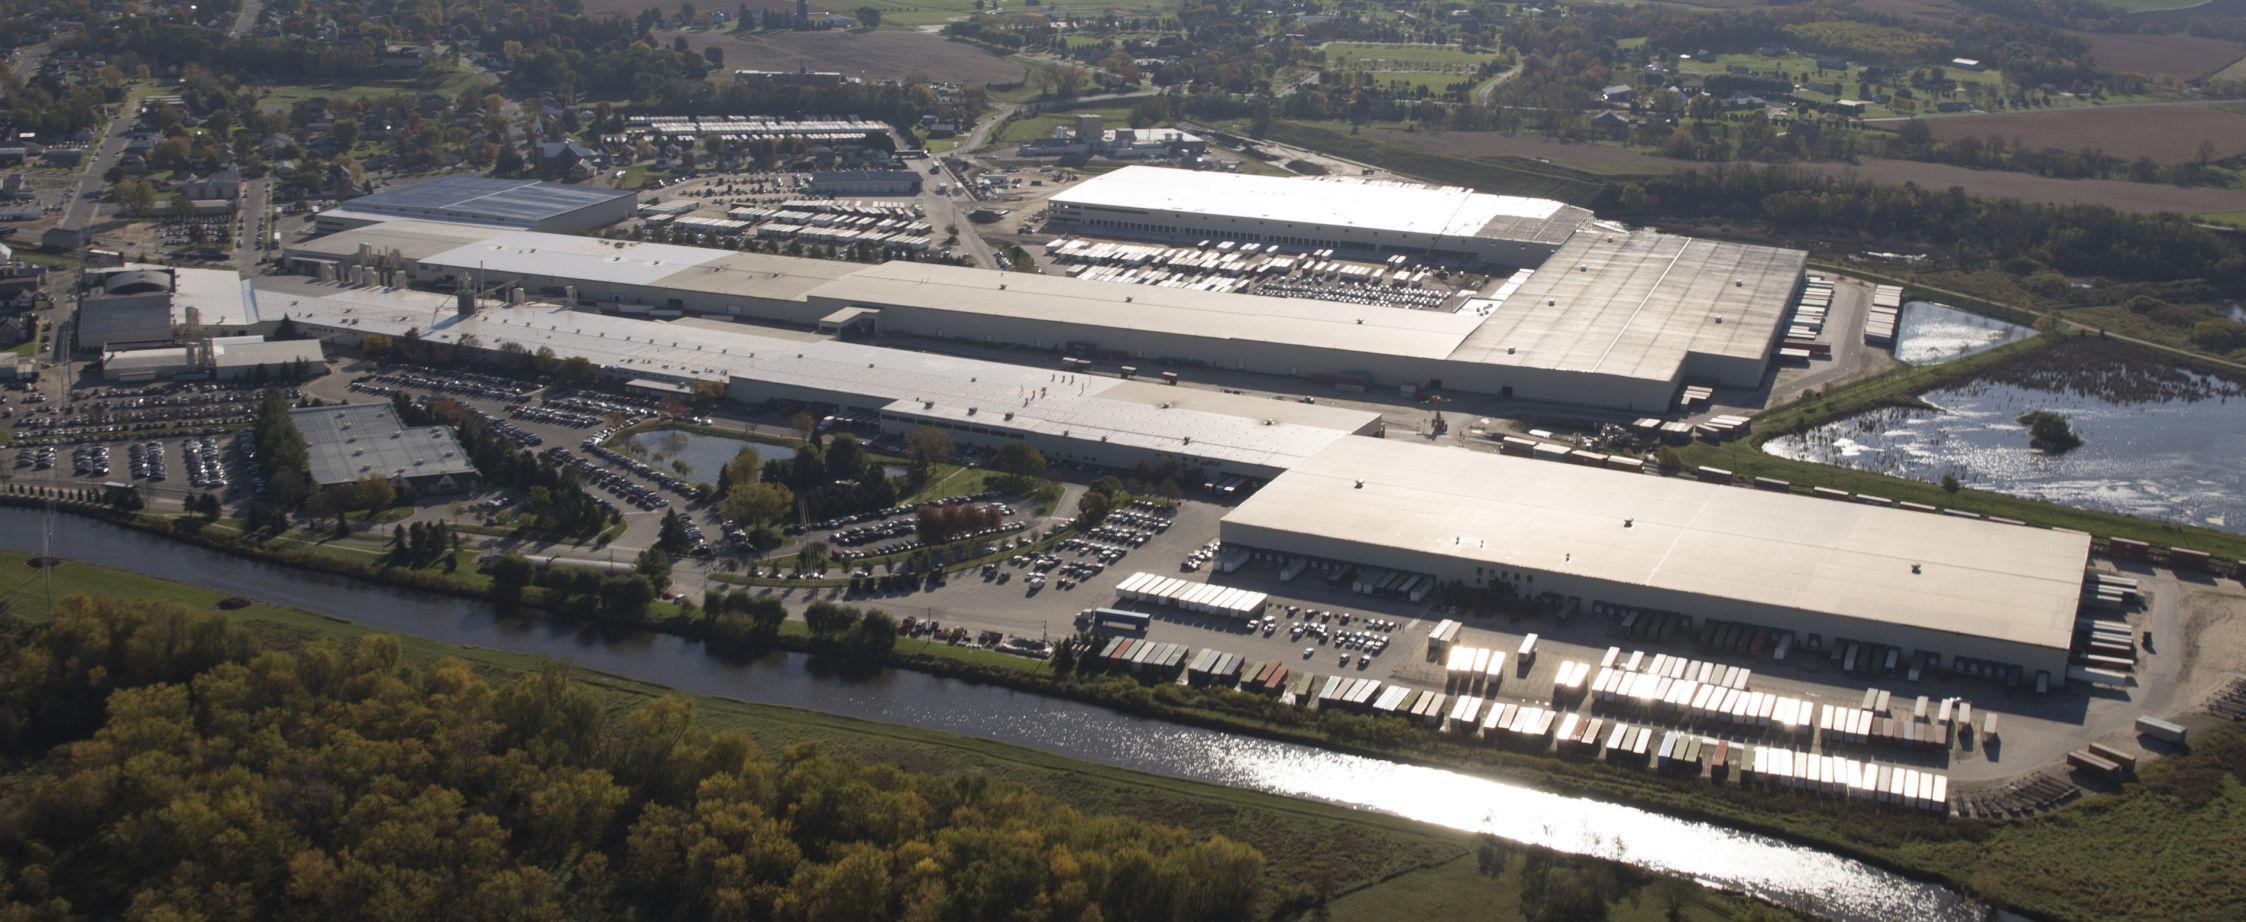 042519 Wsj News Ashley. Ashley Furnitureu0027s Headquarters And Manufacturing  Facility In Arcadia ...